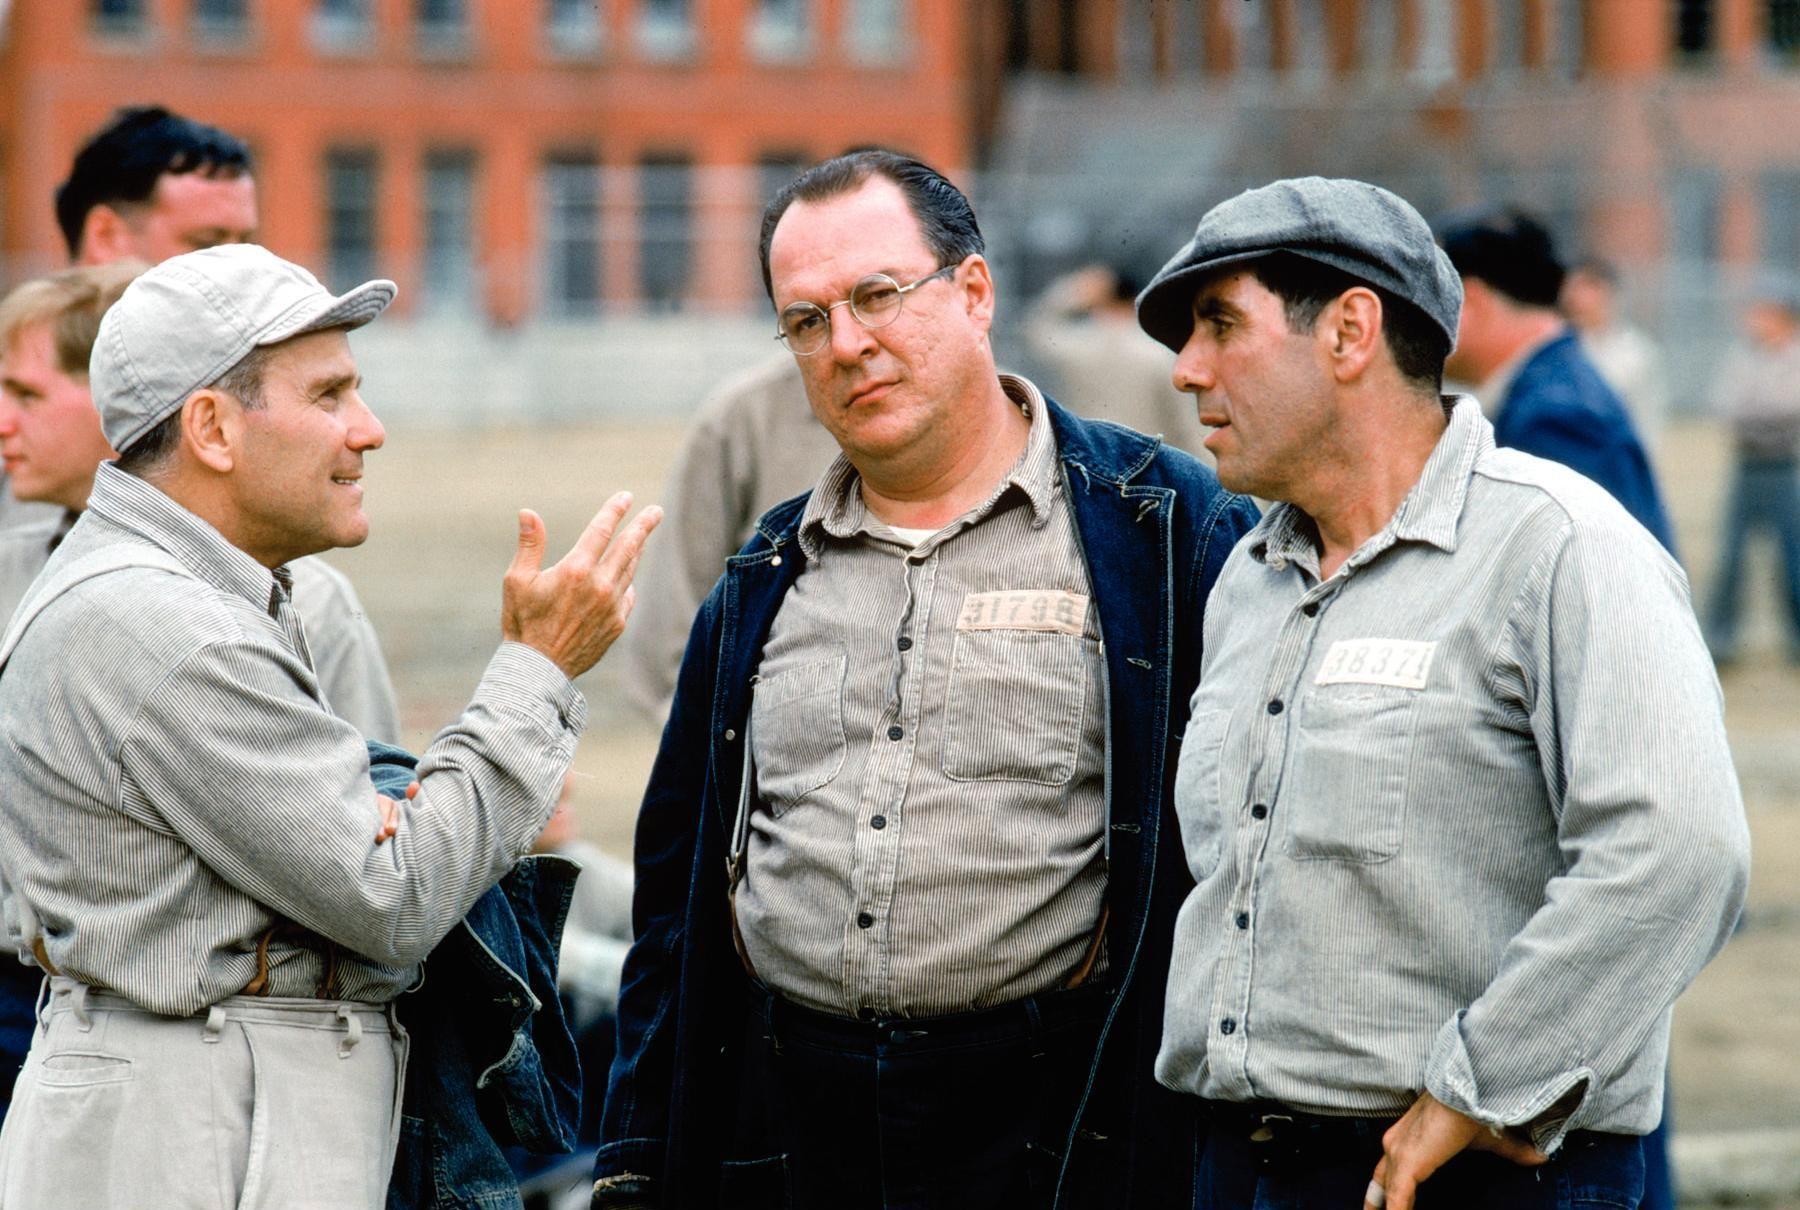 Larry Brandenburg, David Proval, and Joseph Ragno in The Shawshank Redemption (1994)